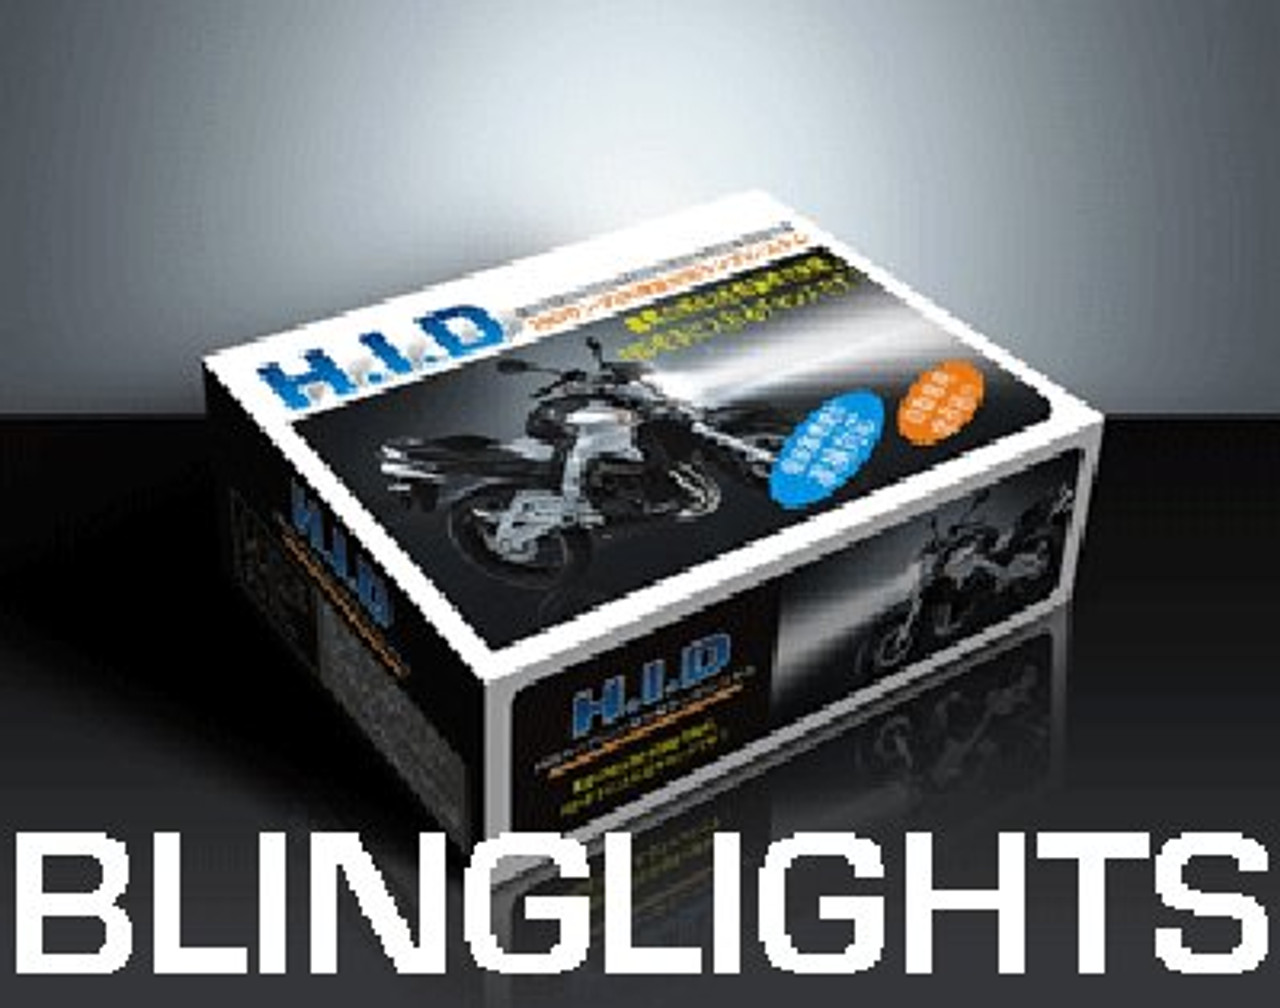 1996-2009 HARLEY-DAVIDSON HERITAGE SOFTTAIL HID HEAD LIGHT LAMP HEADLIGHT 1997 1998 1999 2000 2001